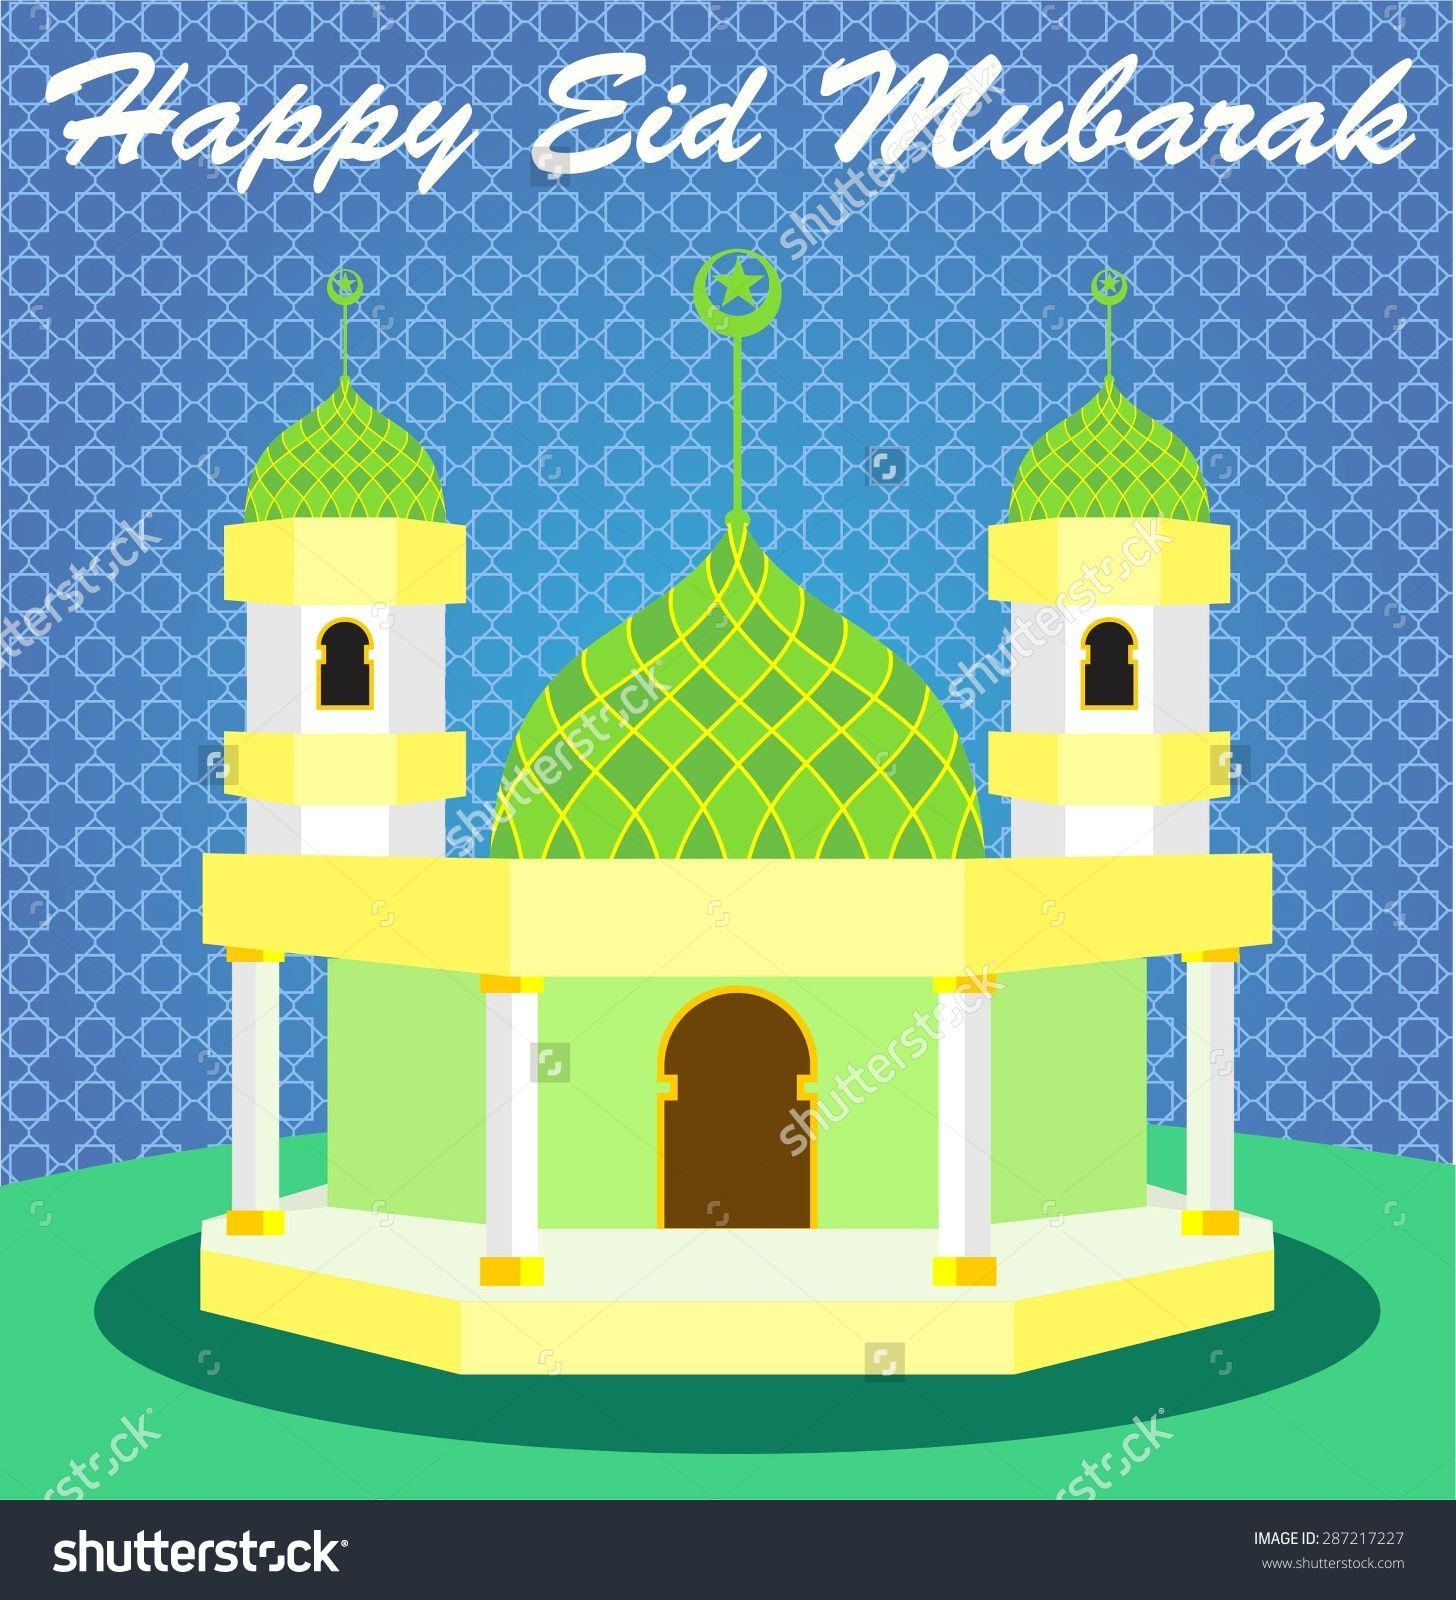 Cartoon dog stock photos images amp pictures shutterstock - Stock Vector Happy Eid Mubarak And Cartoon Mosque